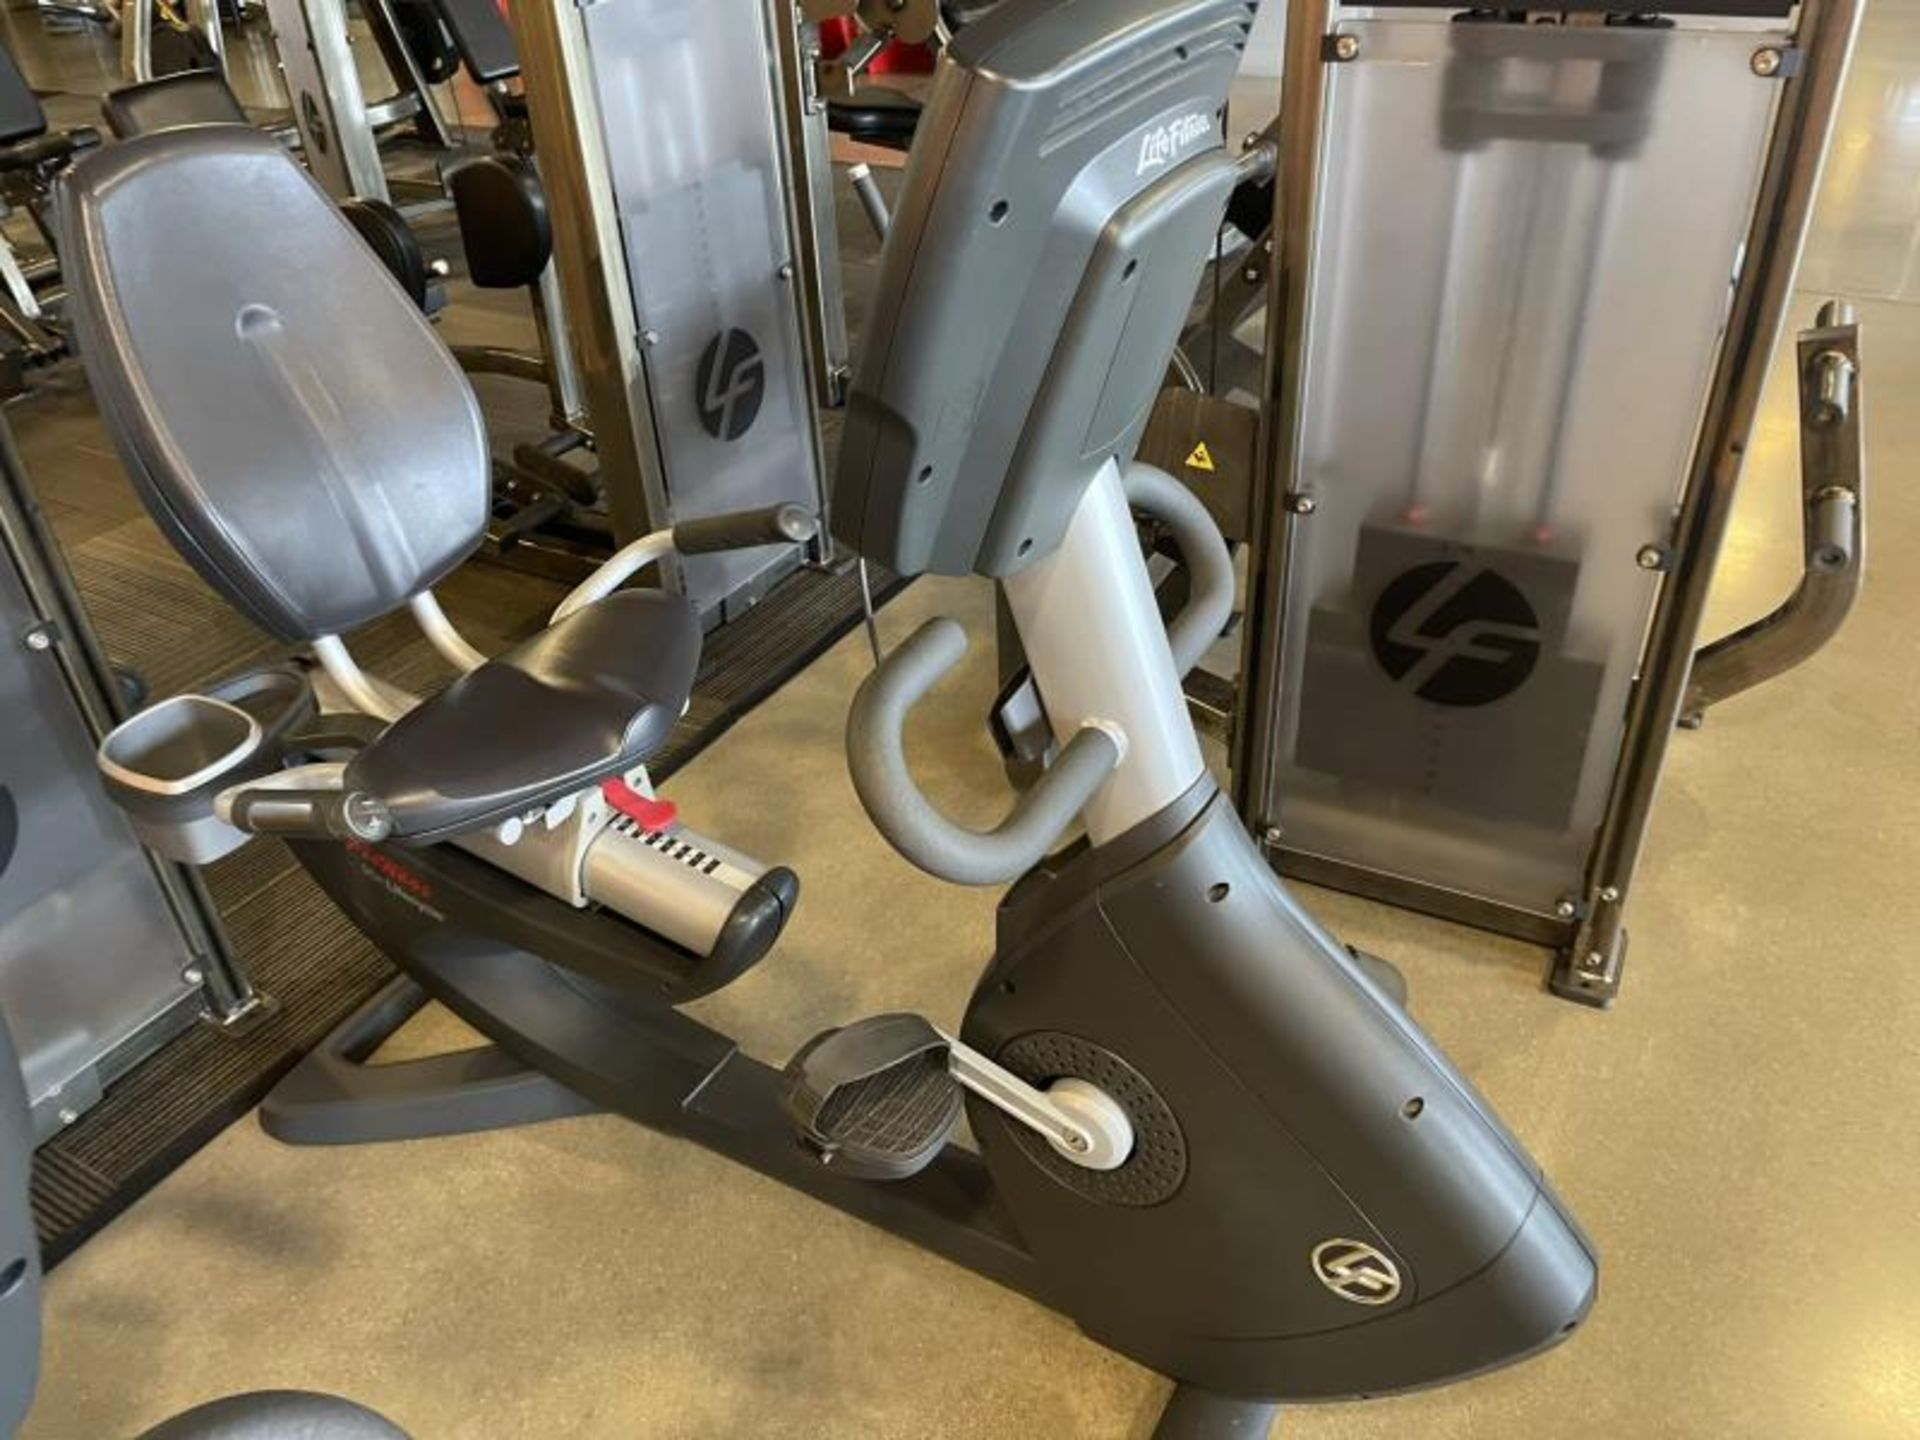 Life Fitness Lifecycle Recumbent Bike M: 95R - Image 3 of 5